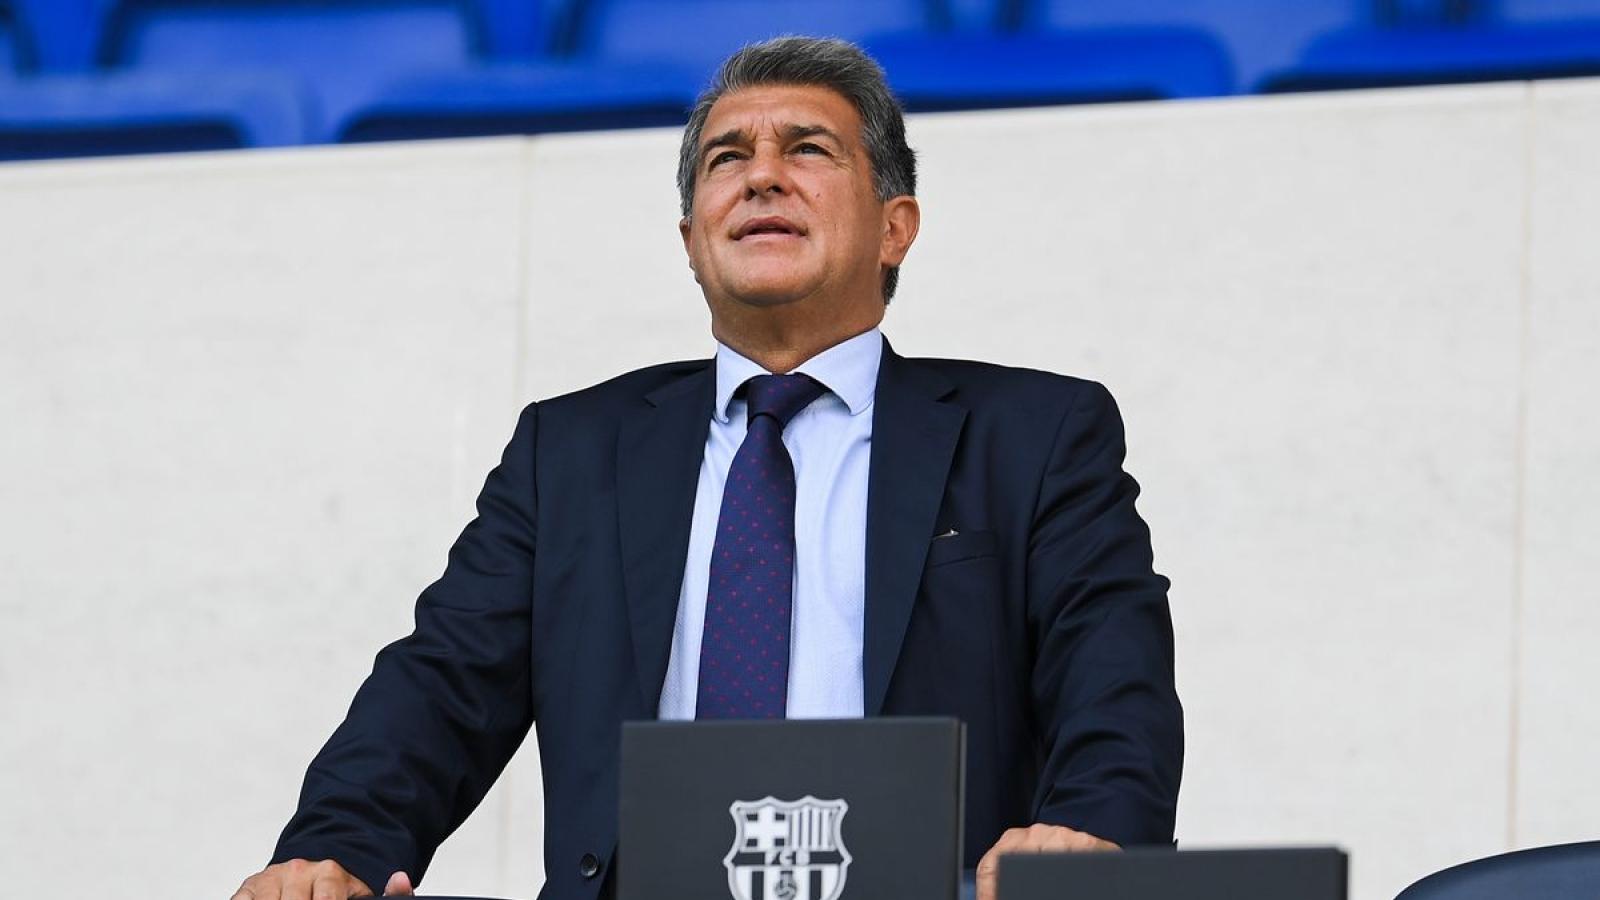 Chủ tịch Laporta kêu gọi CĐV Barca kiên nhẫn sau trận thua Bayern Munich